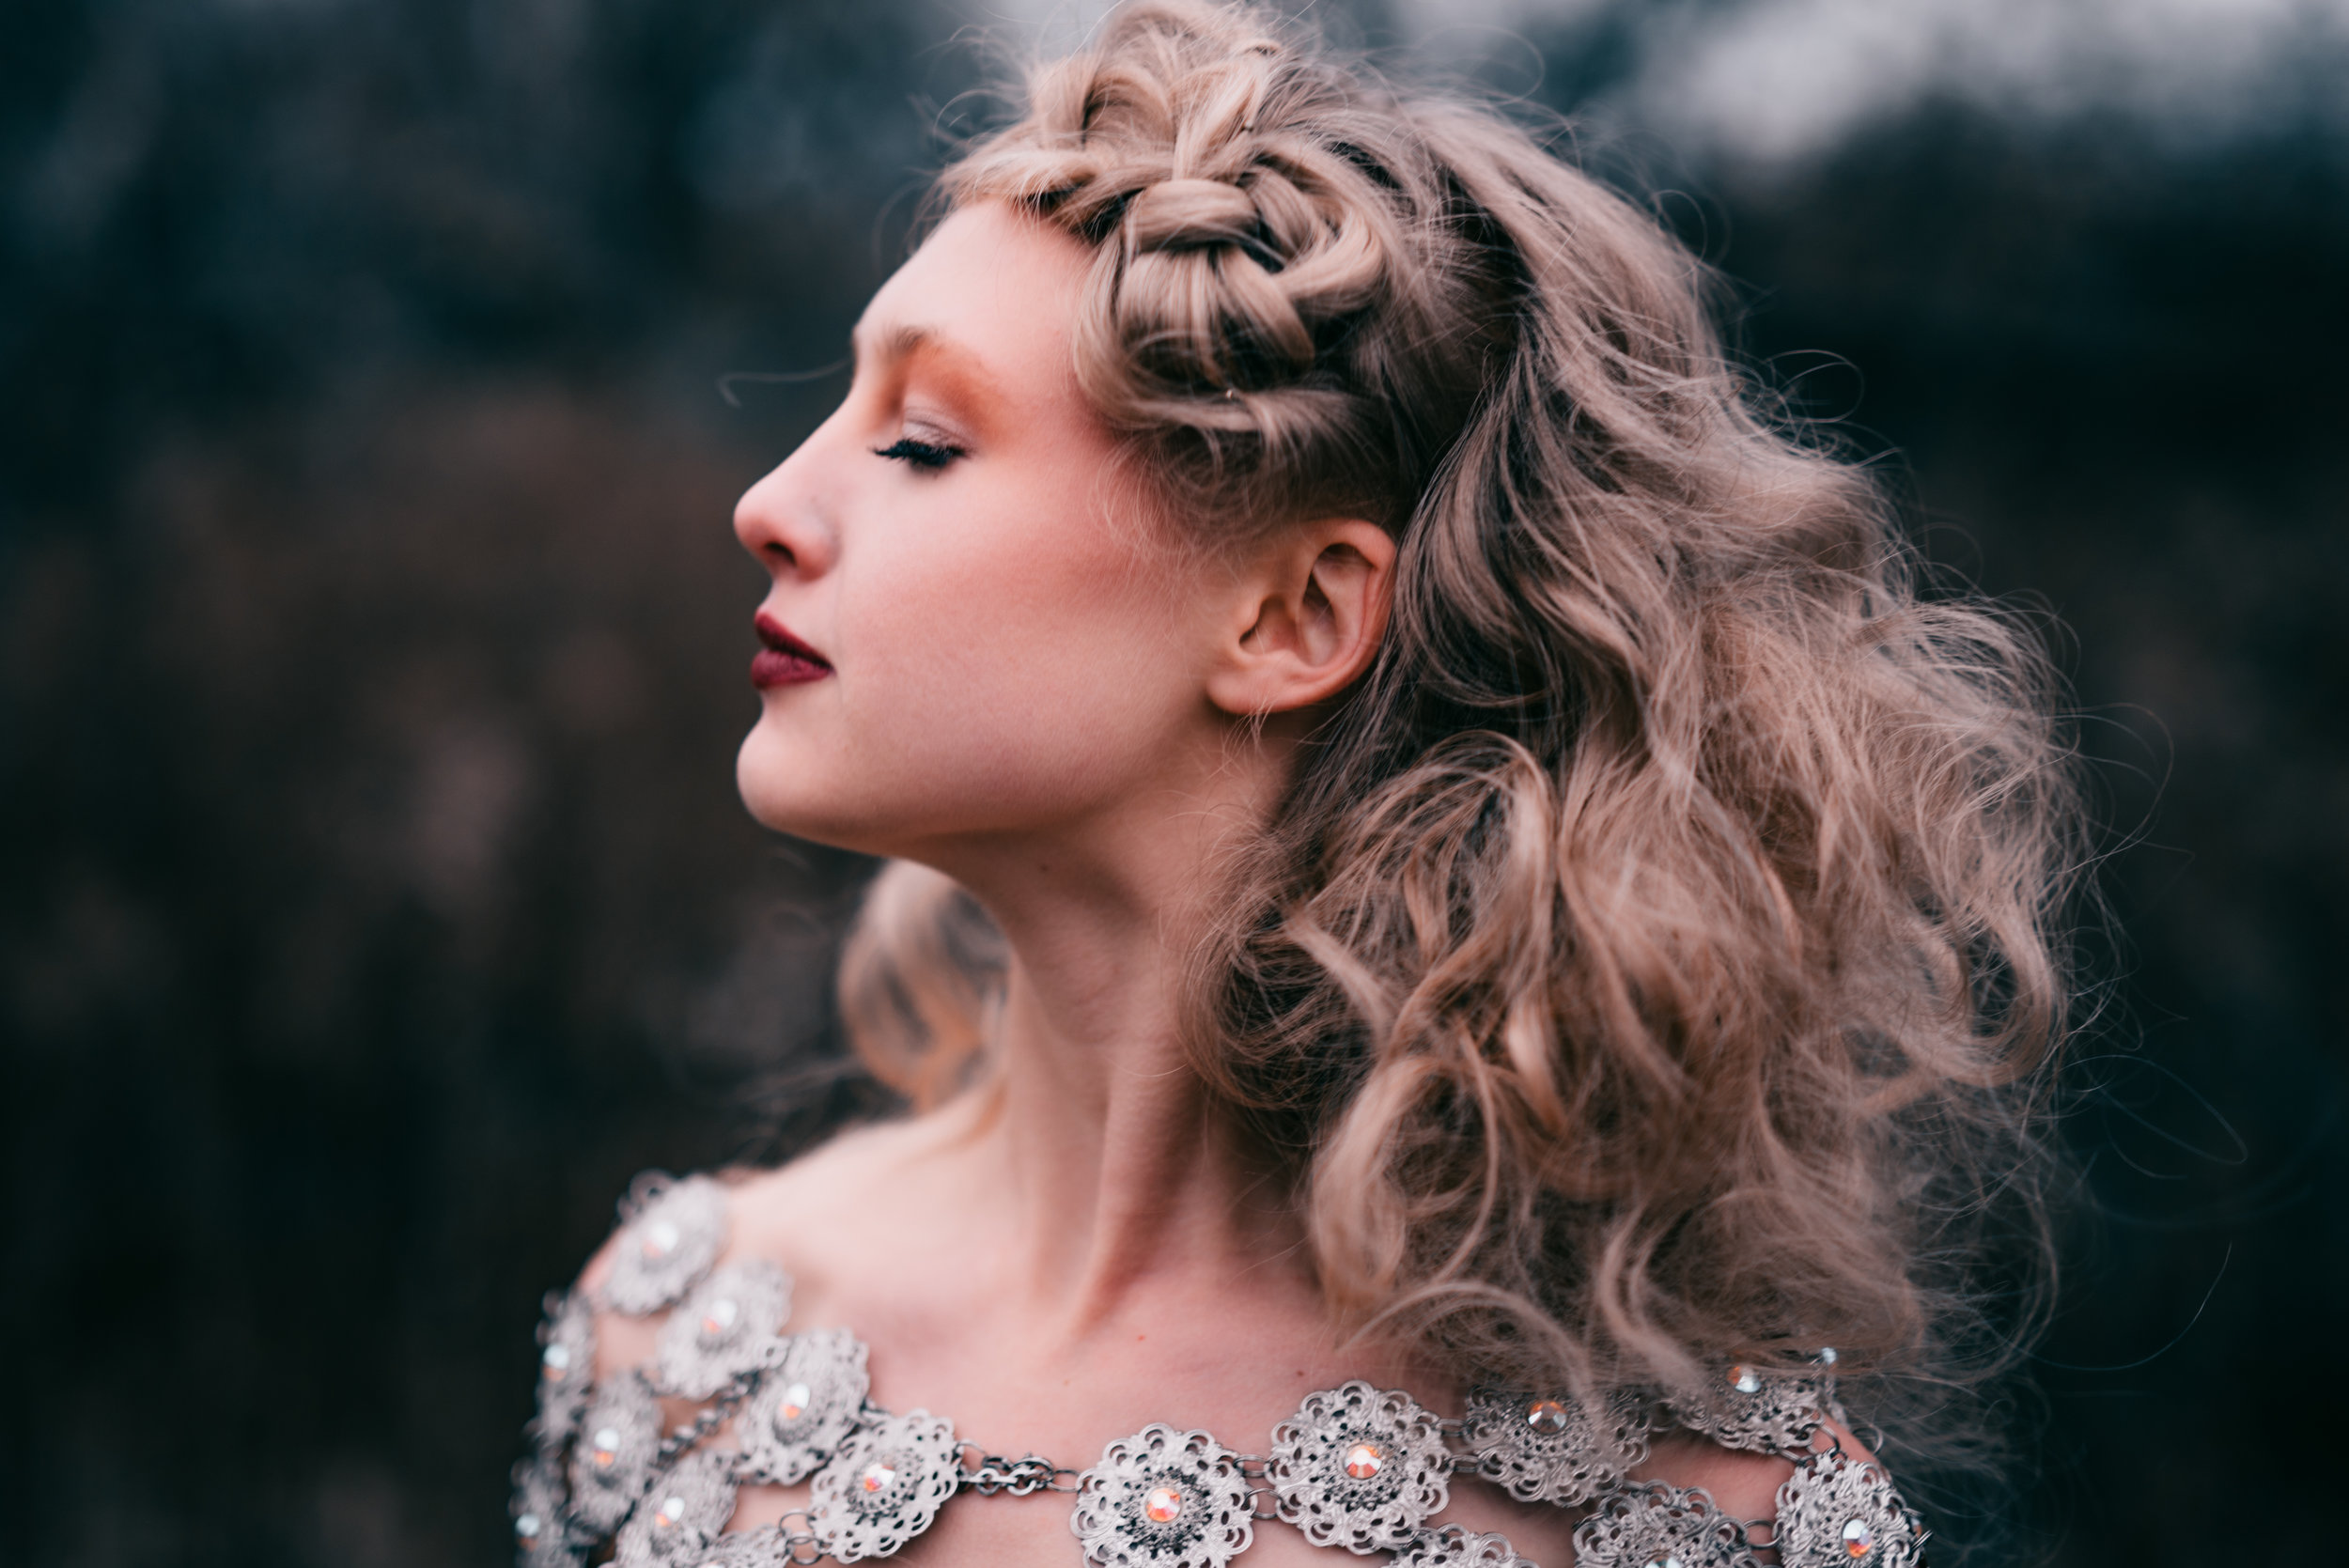 Photographer Regina Wamba   Hair Erika Nash   Makeup/Wardrobe Laura Elizabeth DuVall Seaboy   Models Anna Chance & Forres Floobis Rasmussen